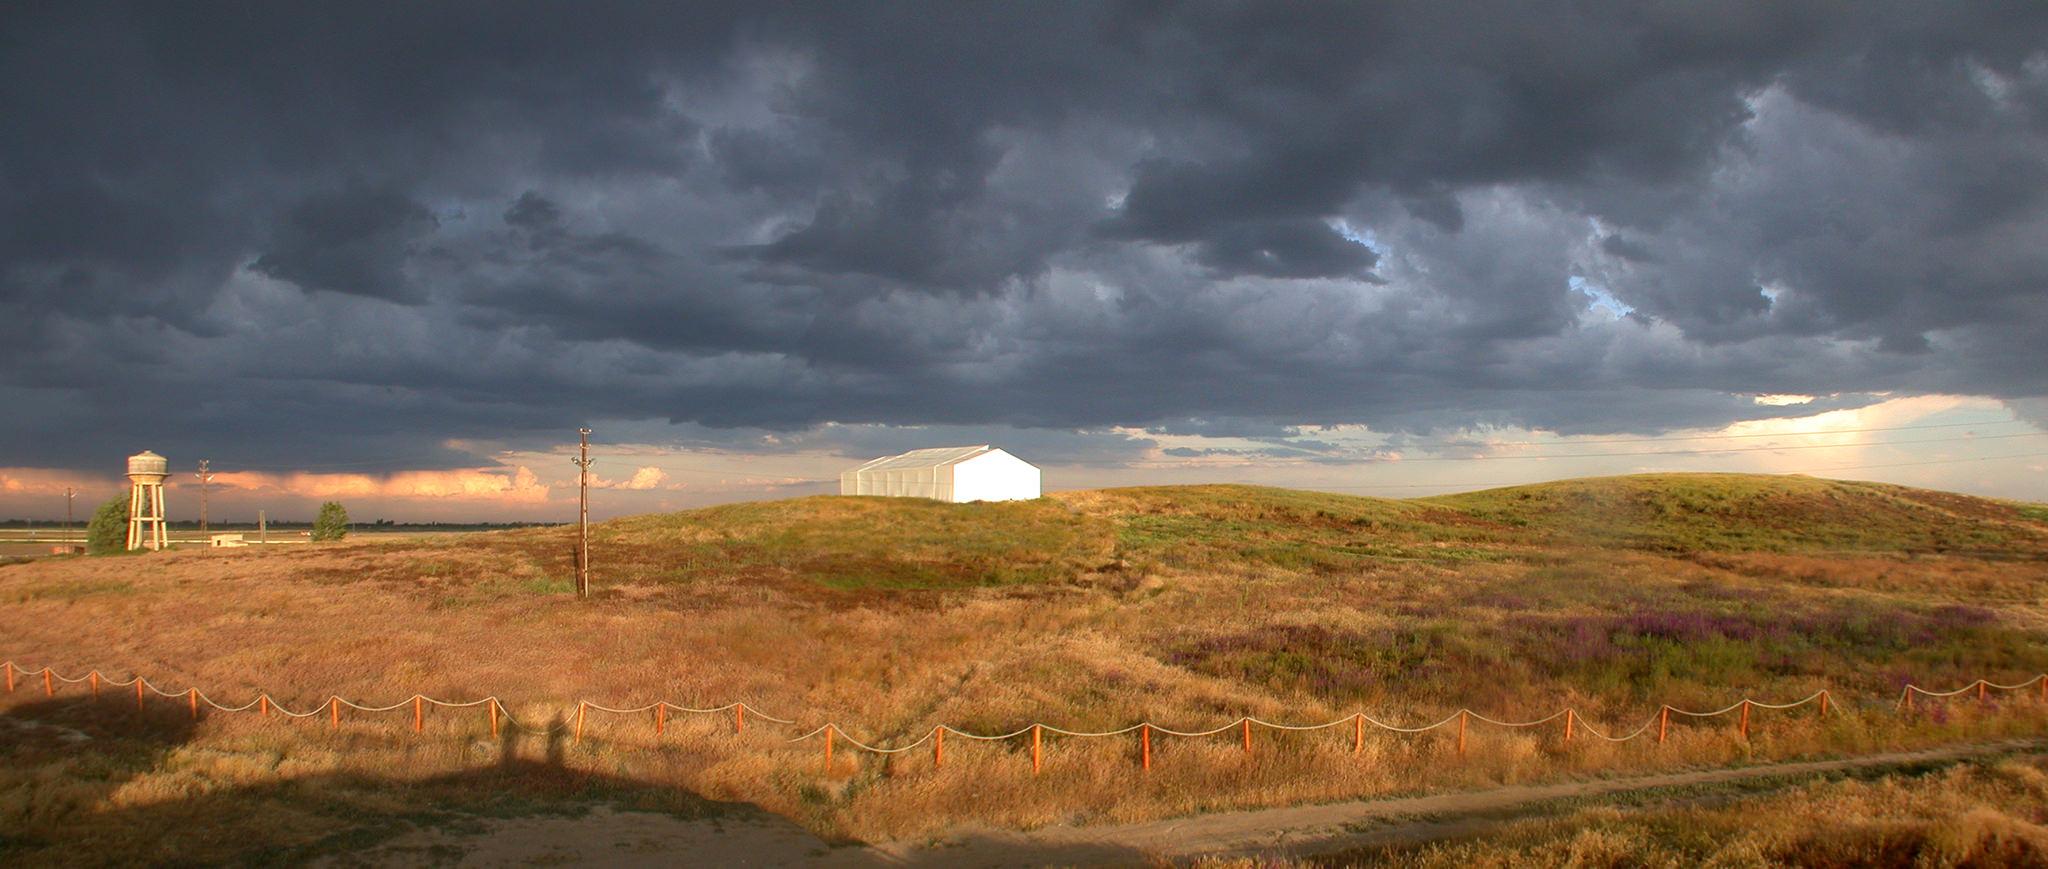 The BaCH tent at Çatalhöyük